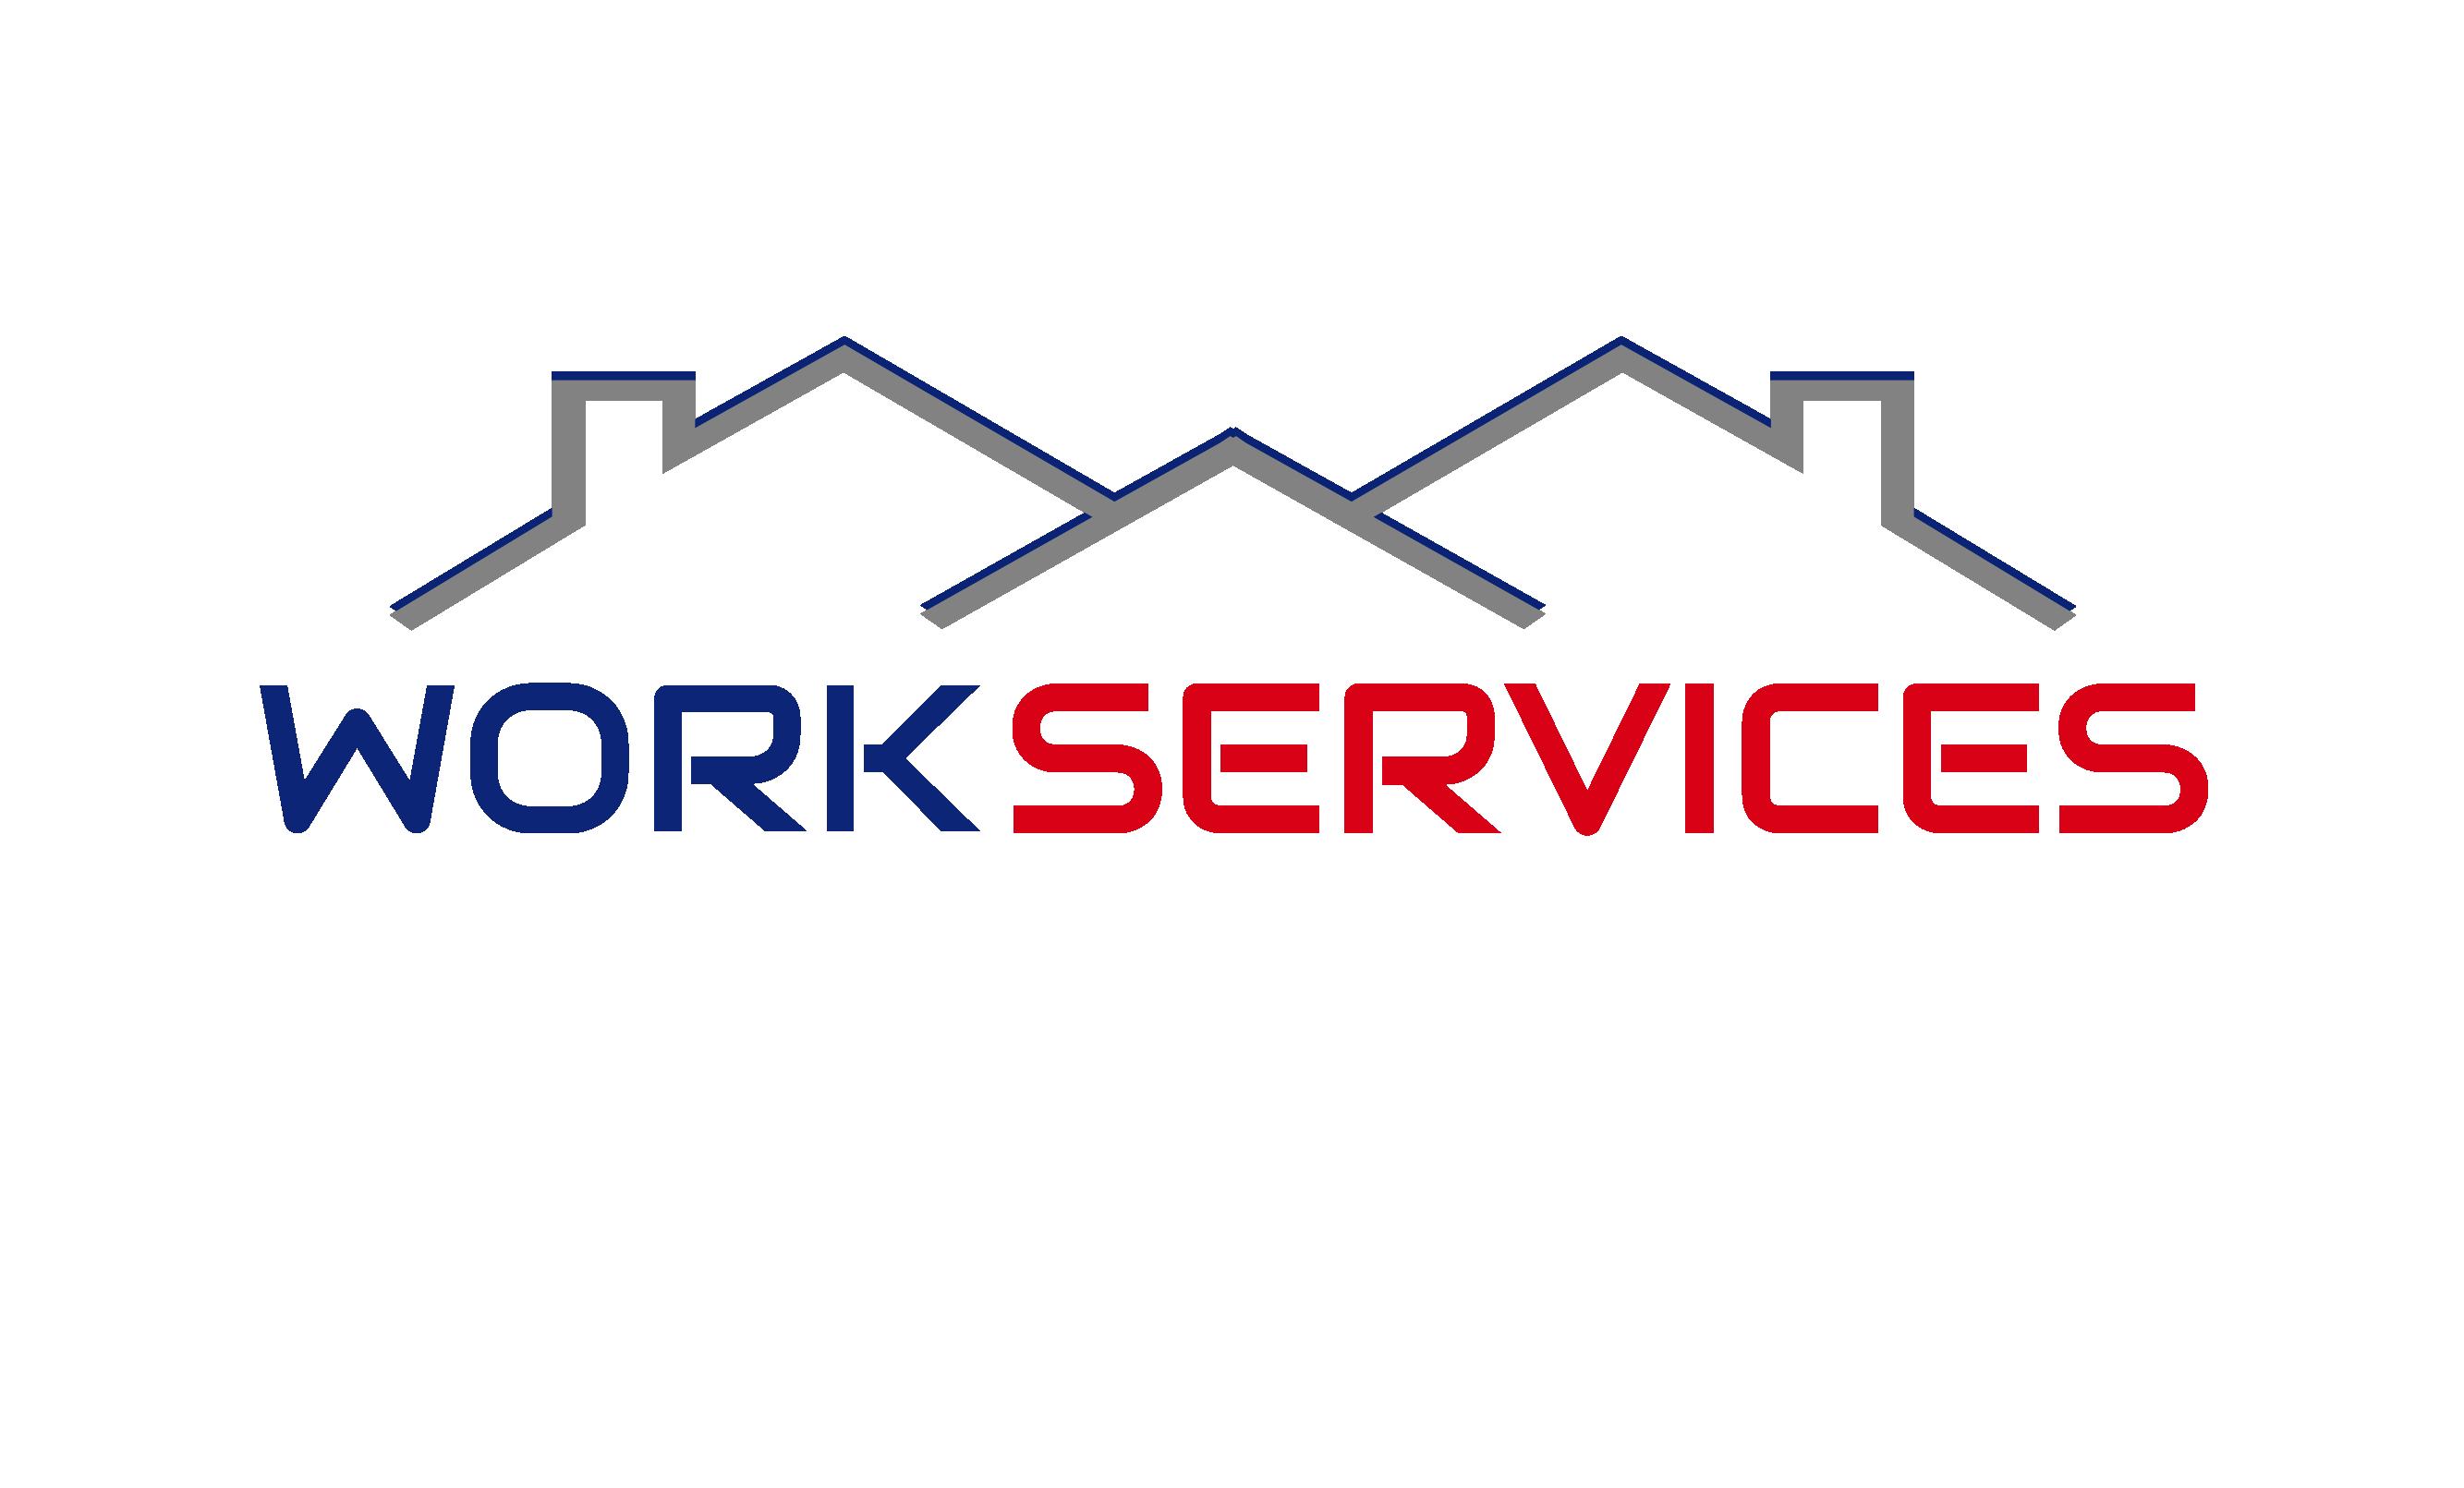 WorkServices